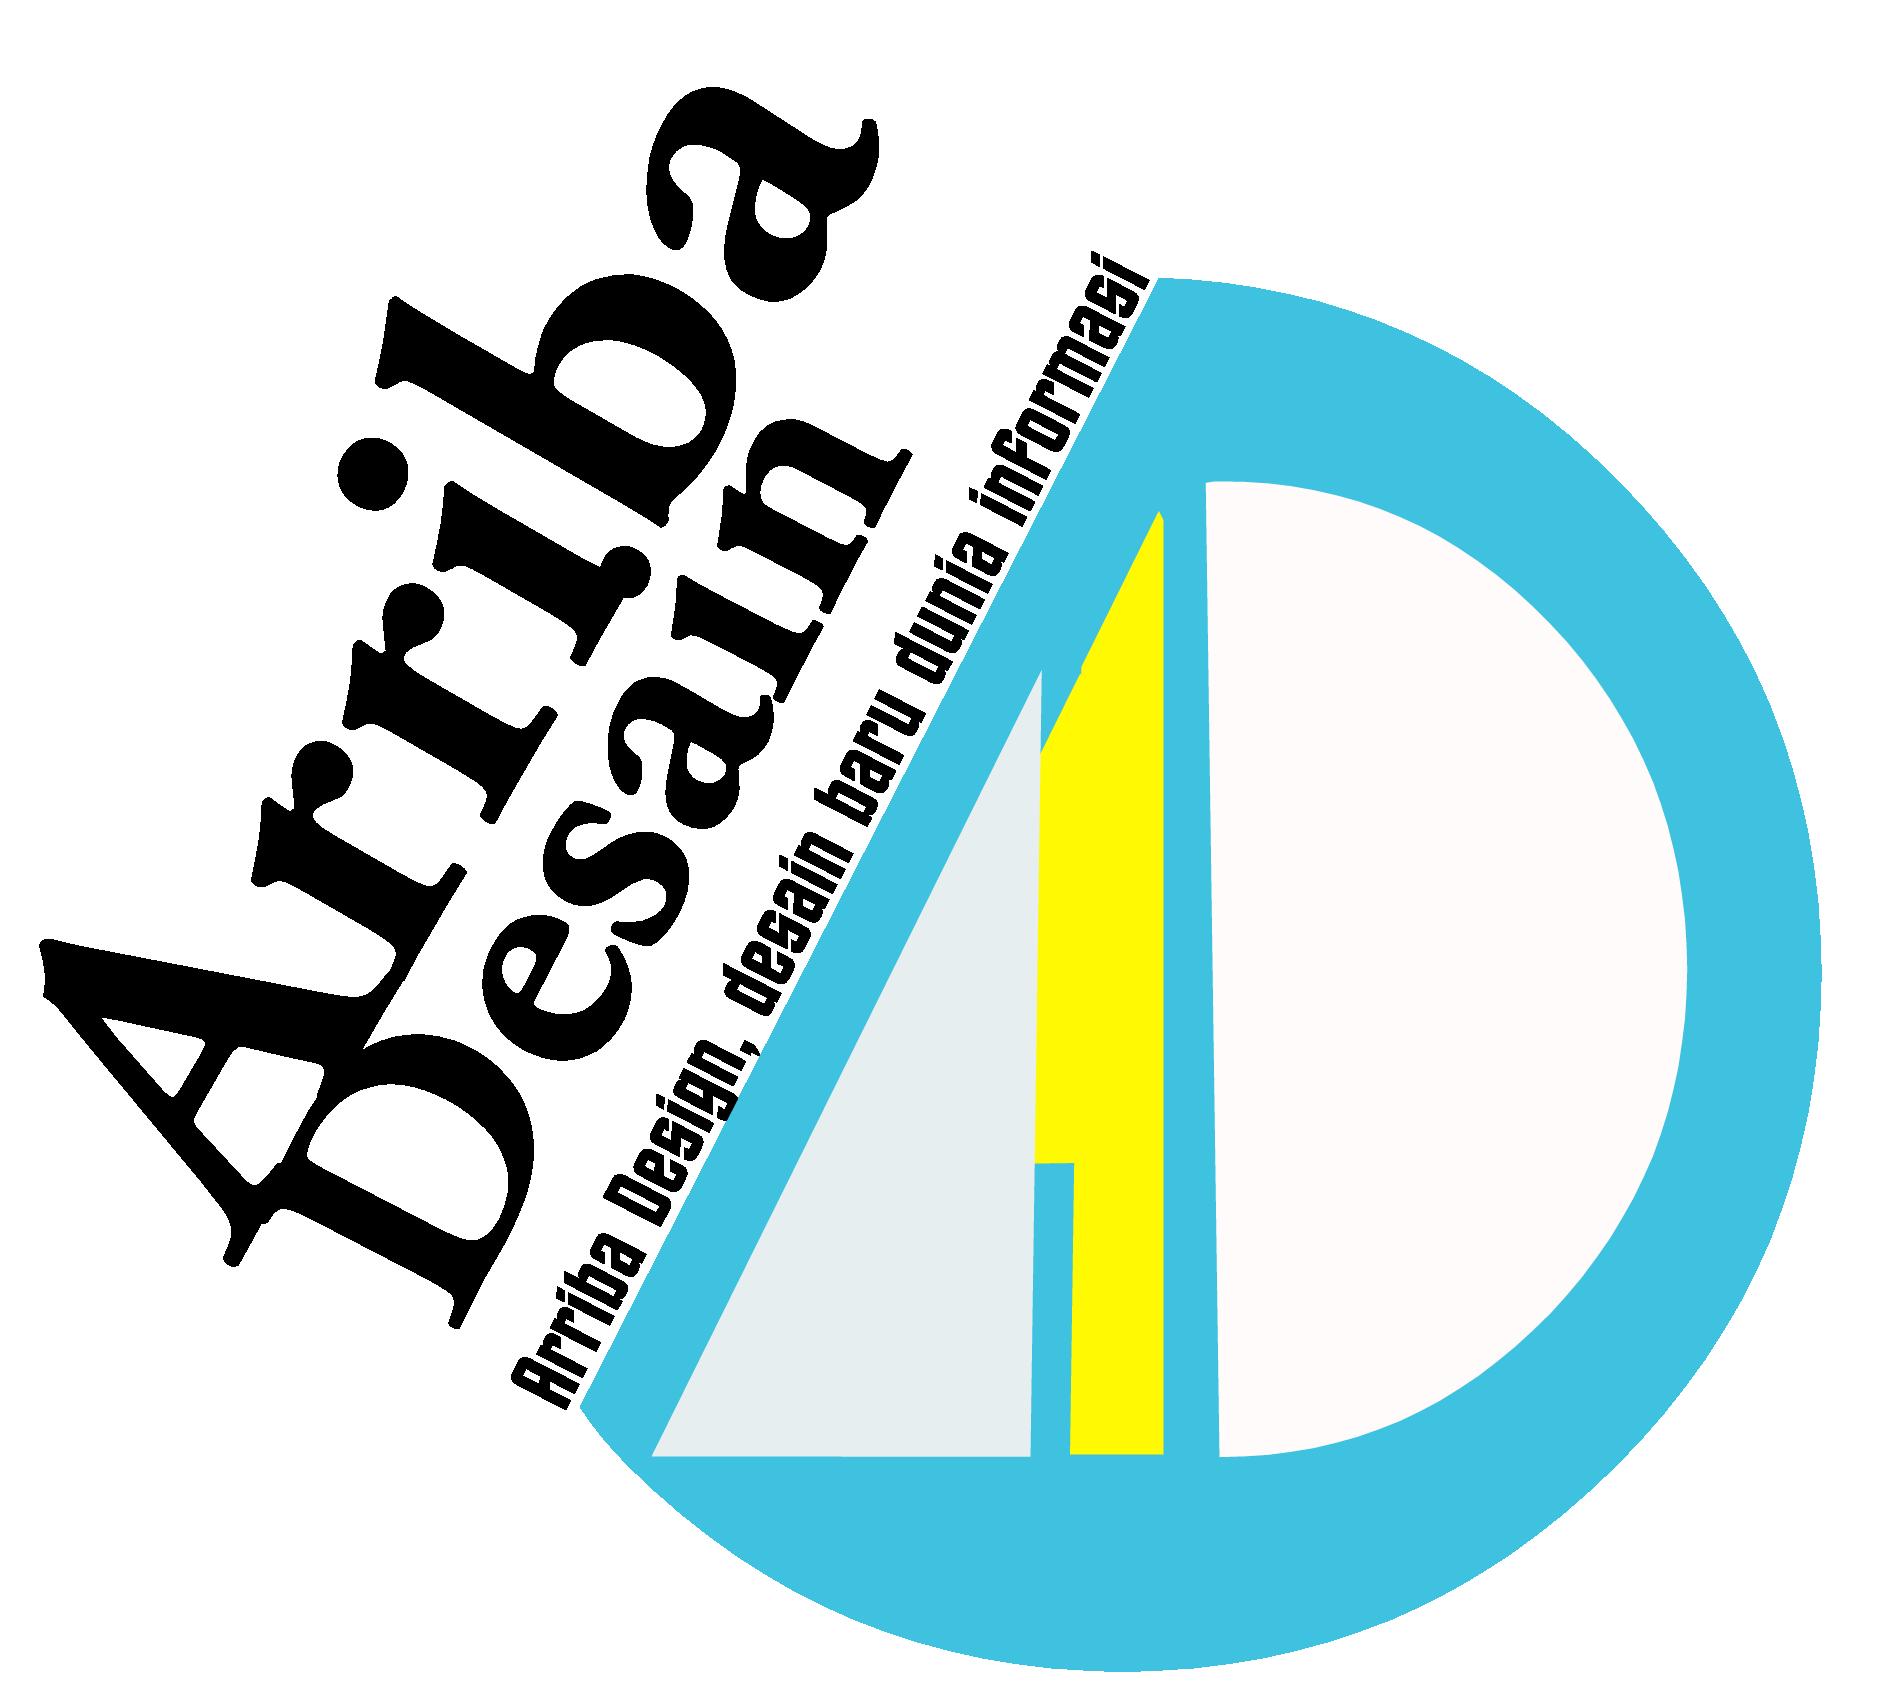 Arriba Design